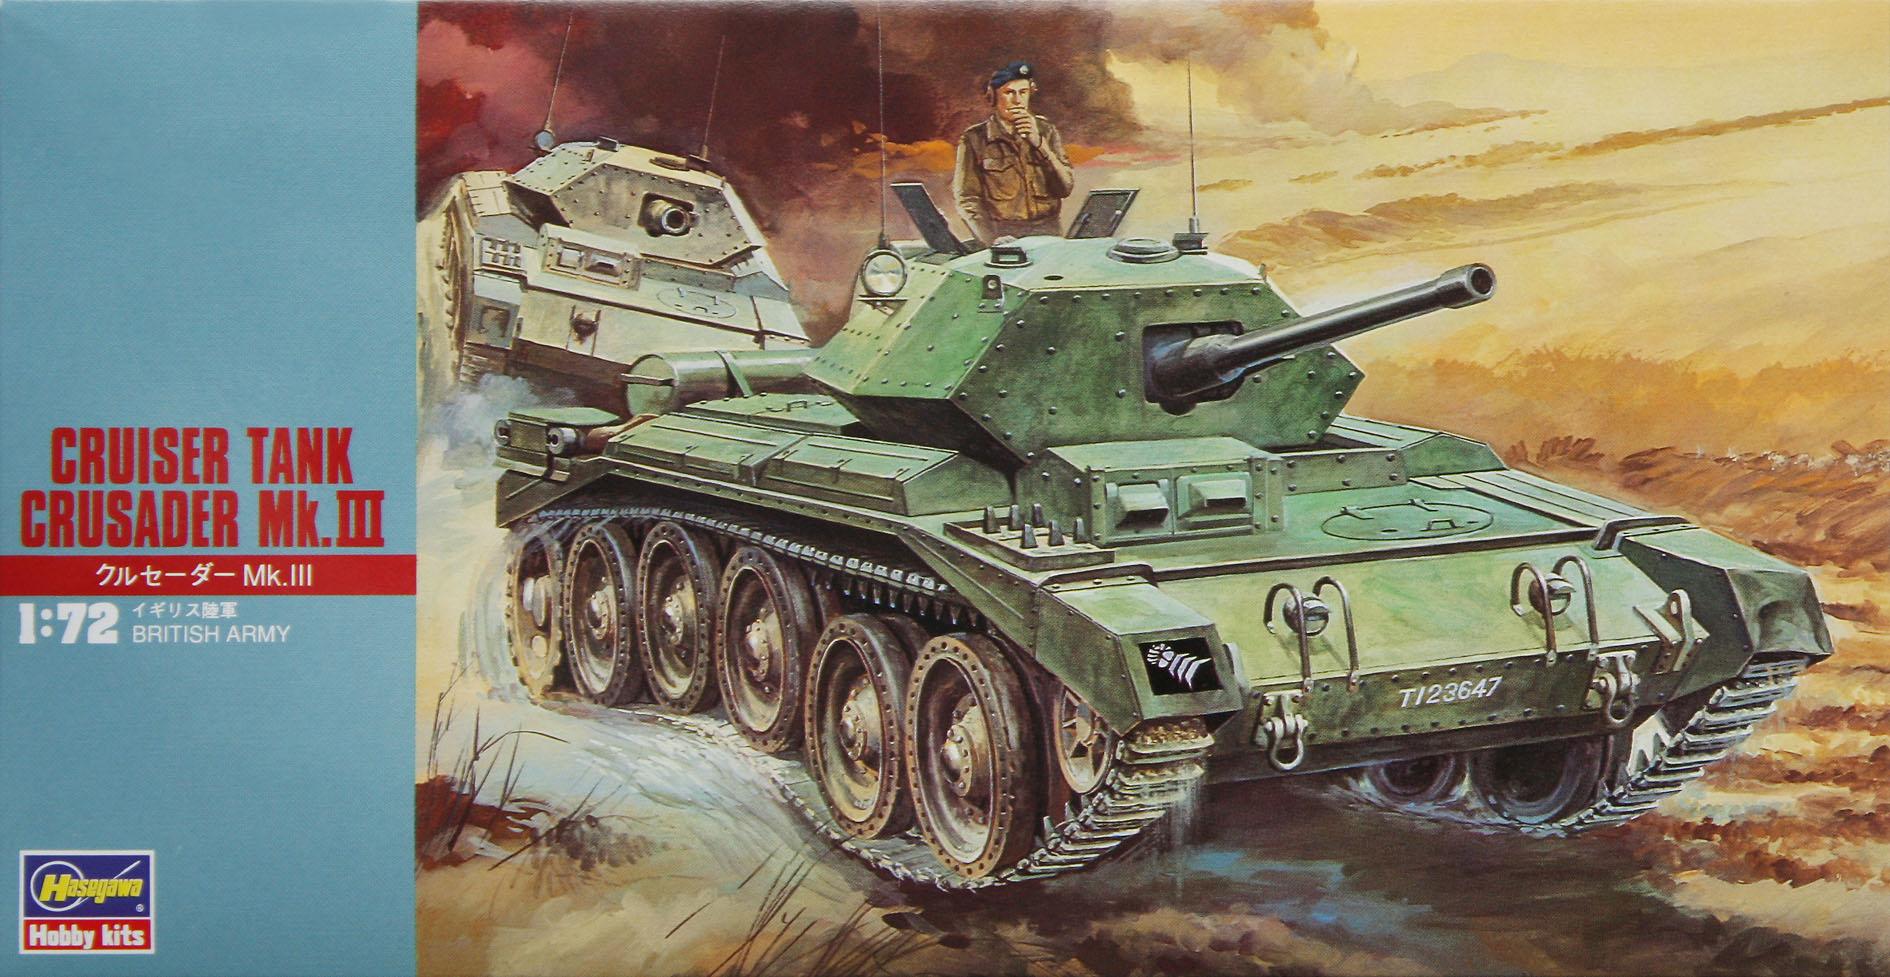 Hasegawa 1/72 Cruiser Tank Crusader Mk.III